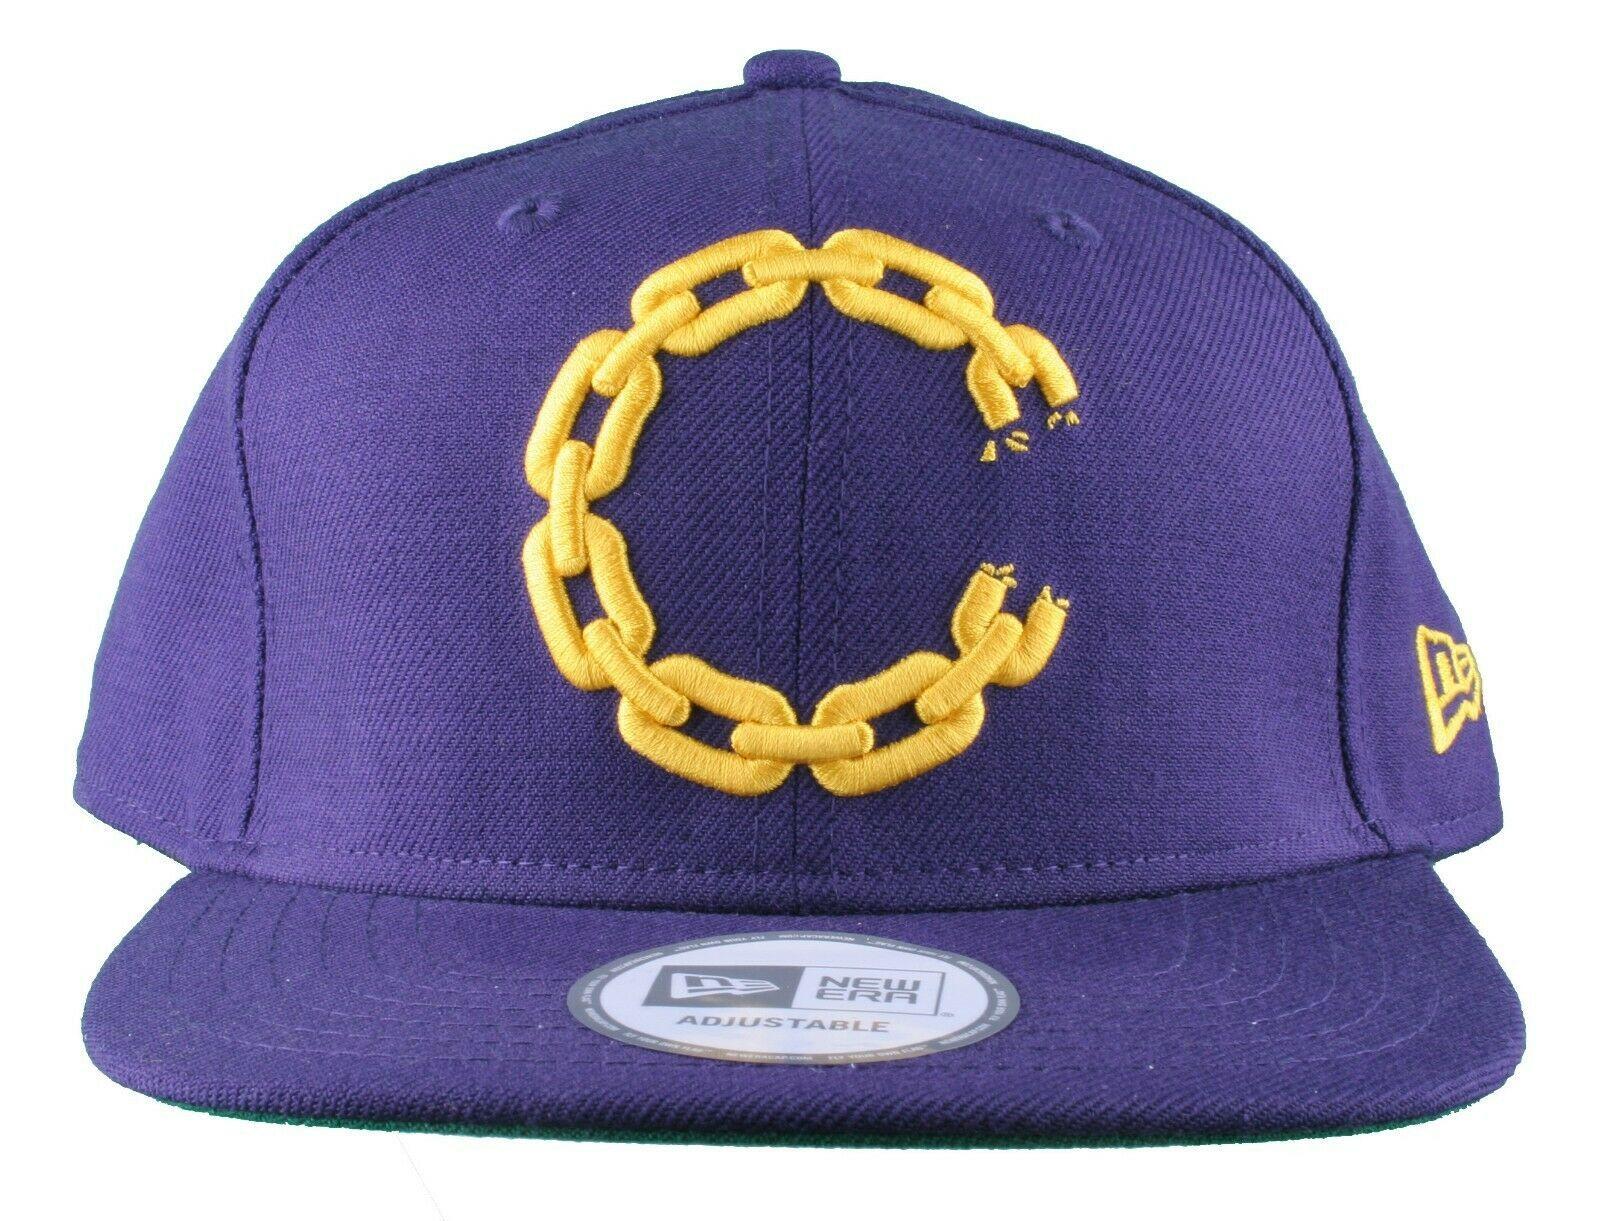 Crooks & Castles New Era Purple/Yellow or Khaki Chain C Snapback Hat